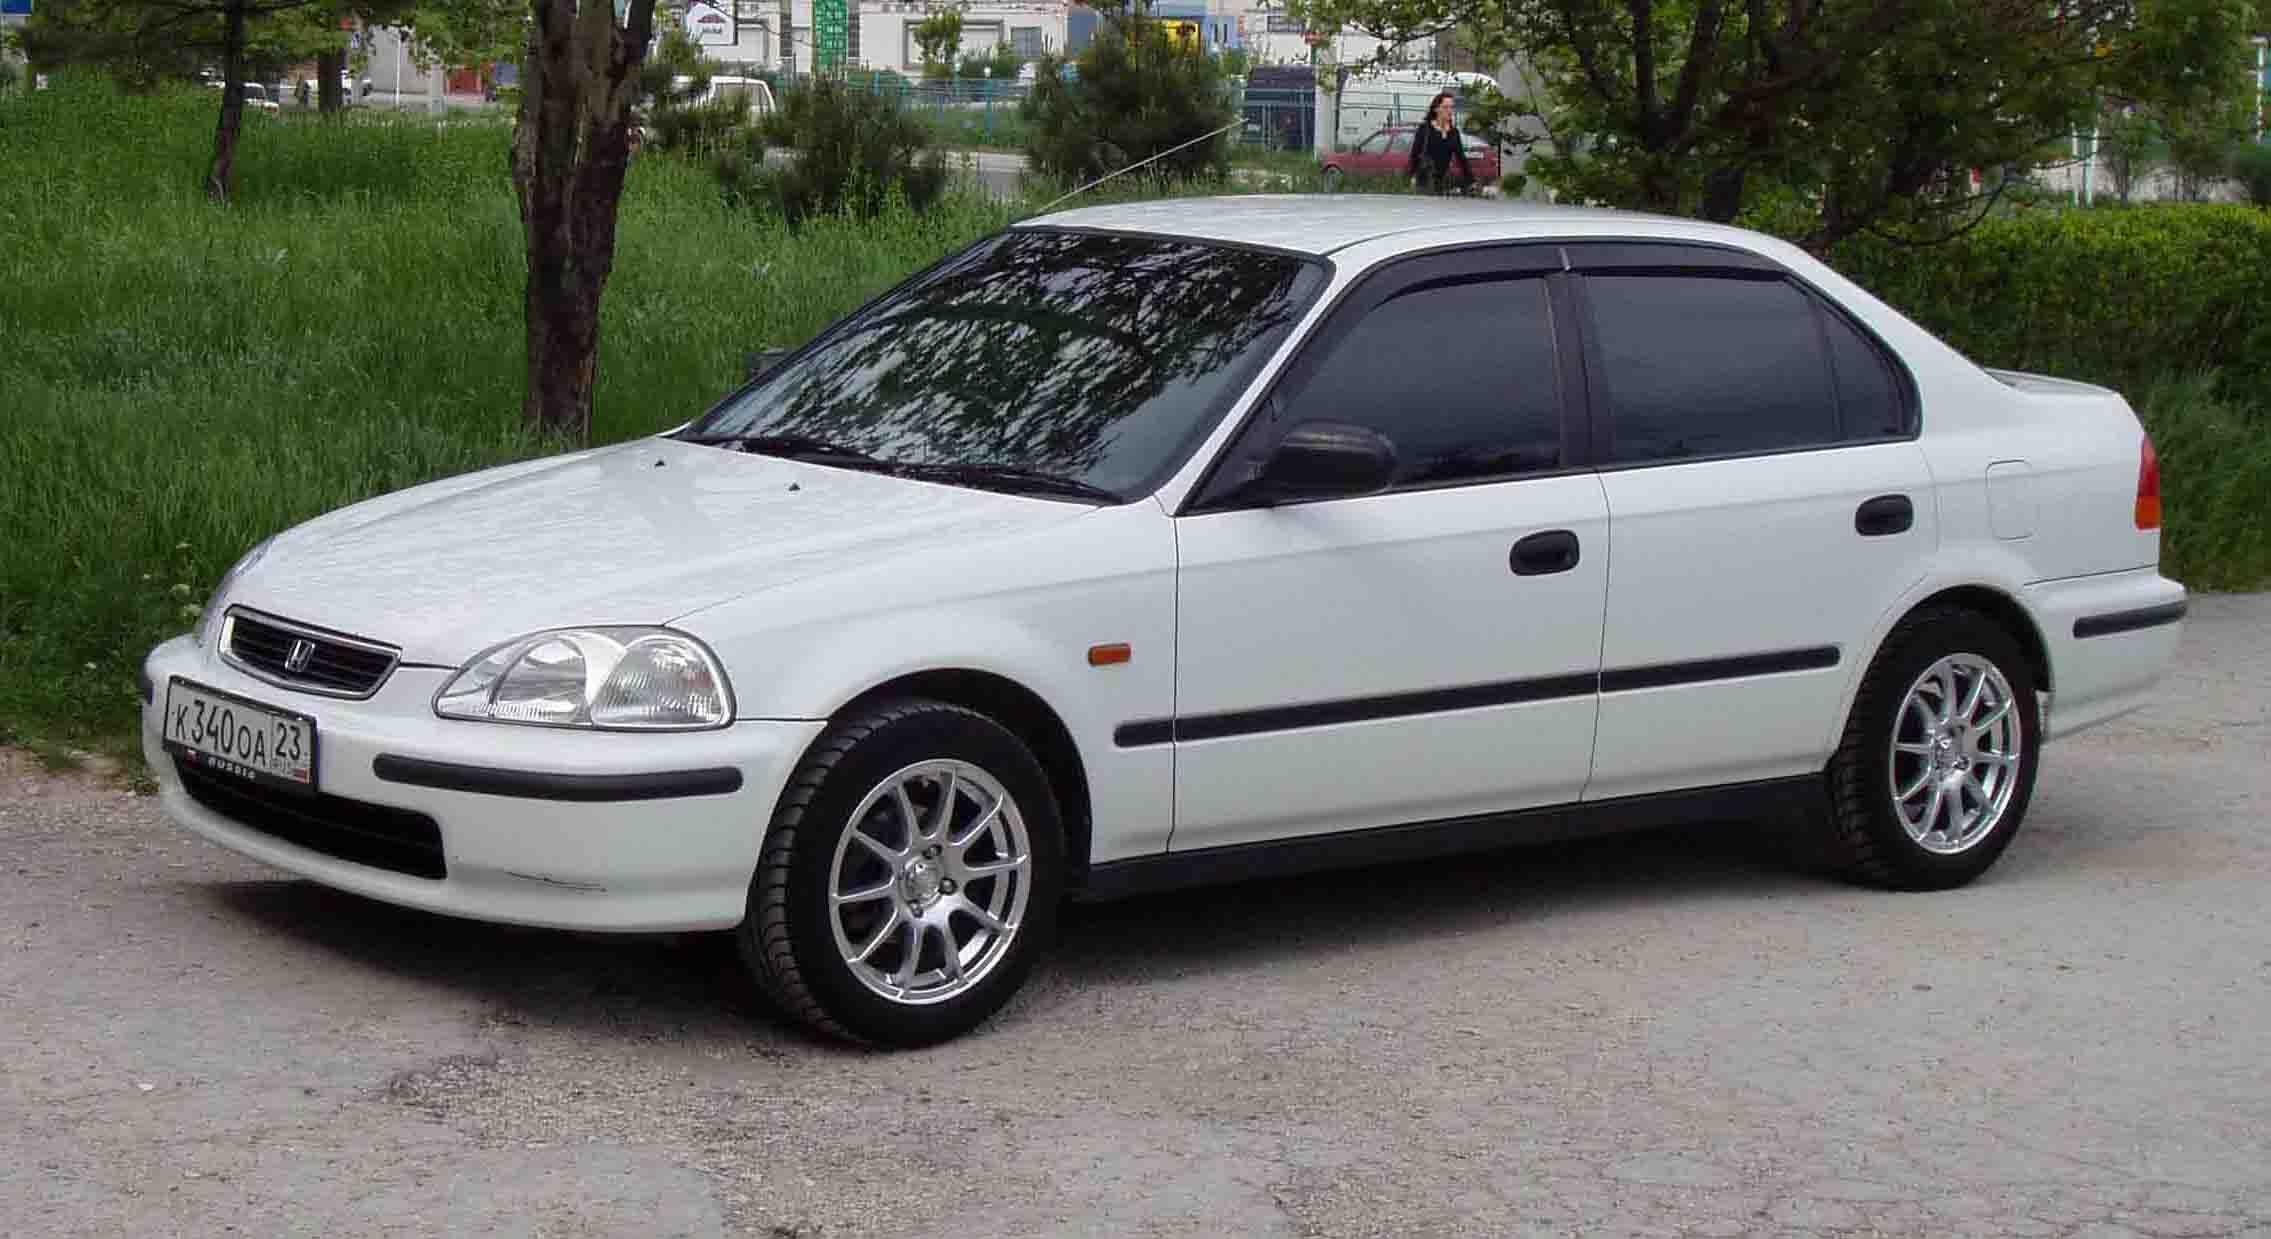 Хонда цивик 1998 фото